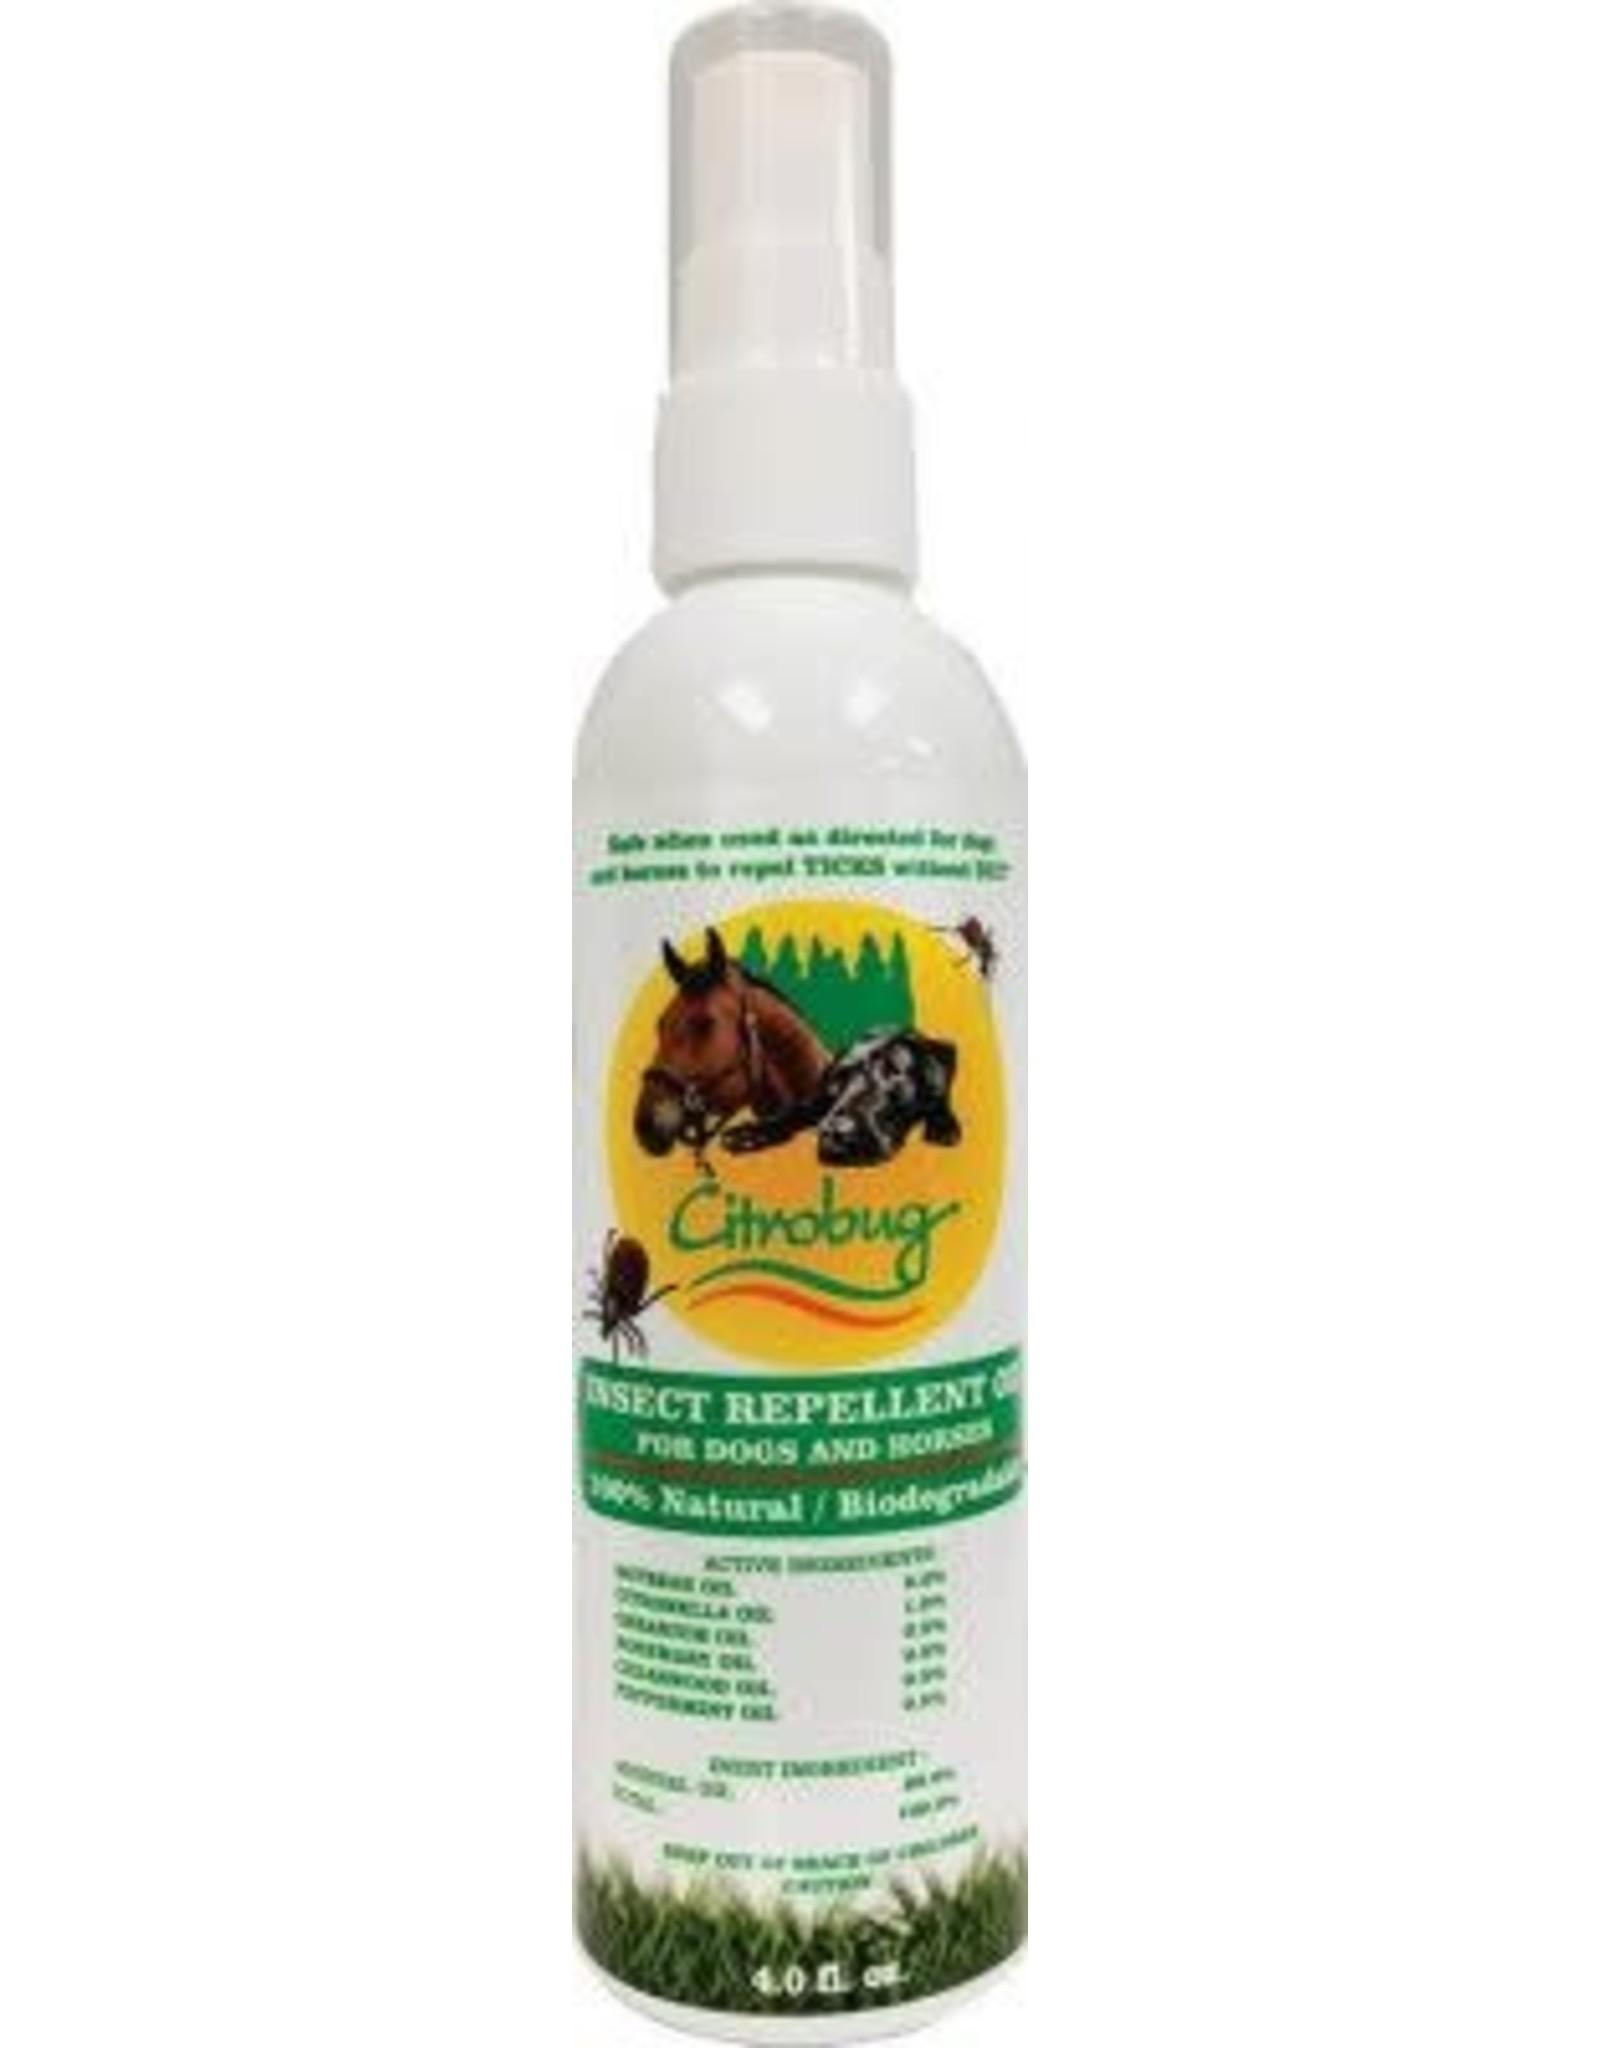 Citrobug Citrobug Insect Reppellent for Dogs 125ml